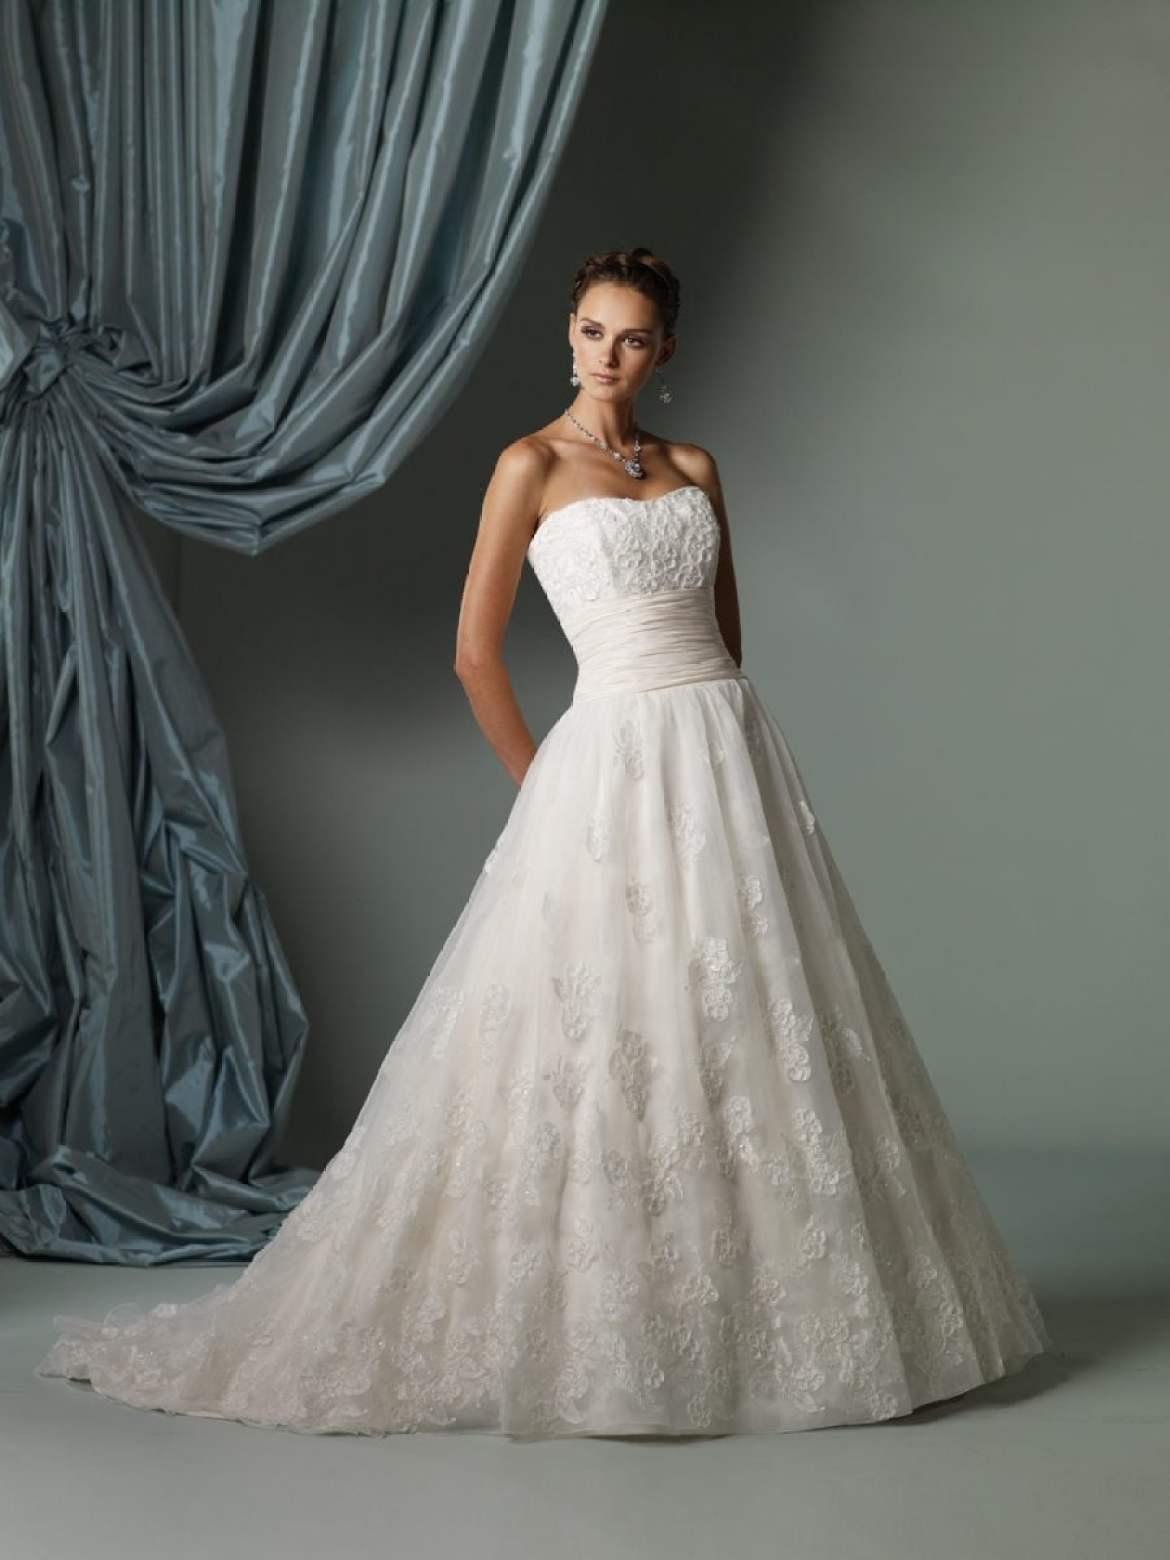 Vestido de noiva tomara-que-caia corte evasê. Da Tutti Sposa.